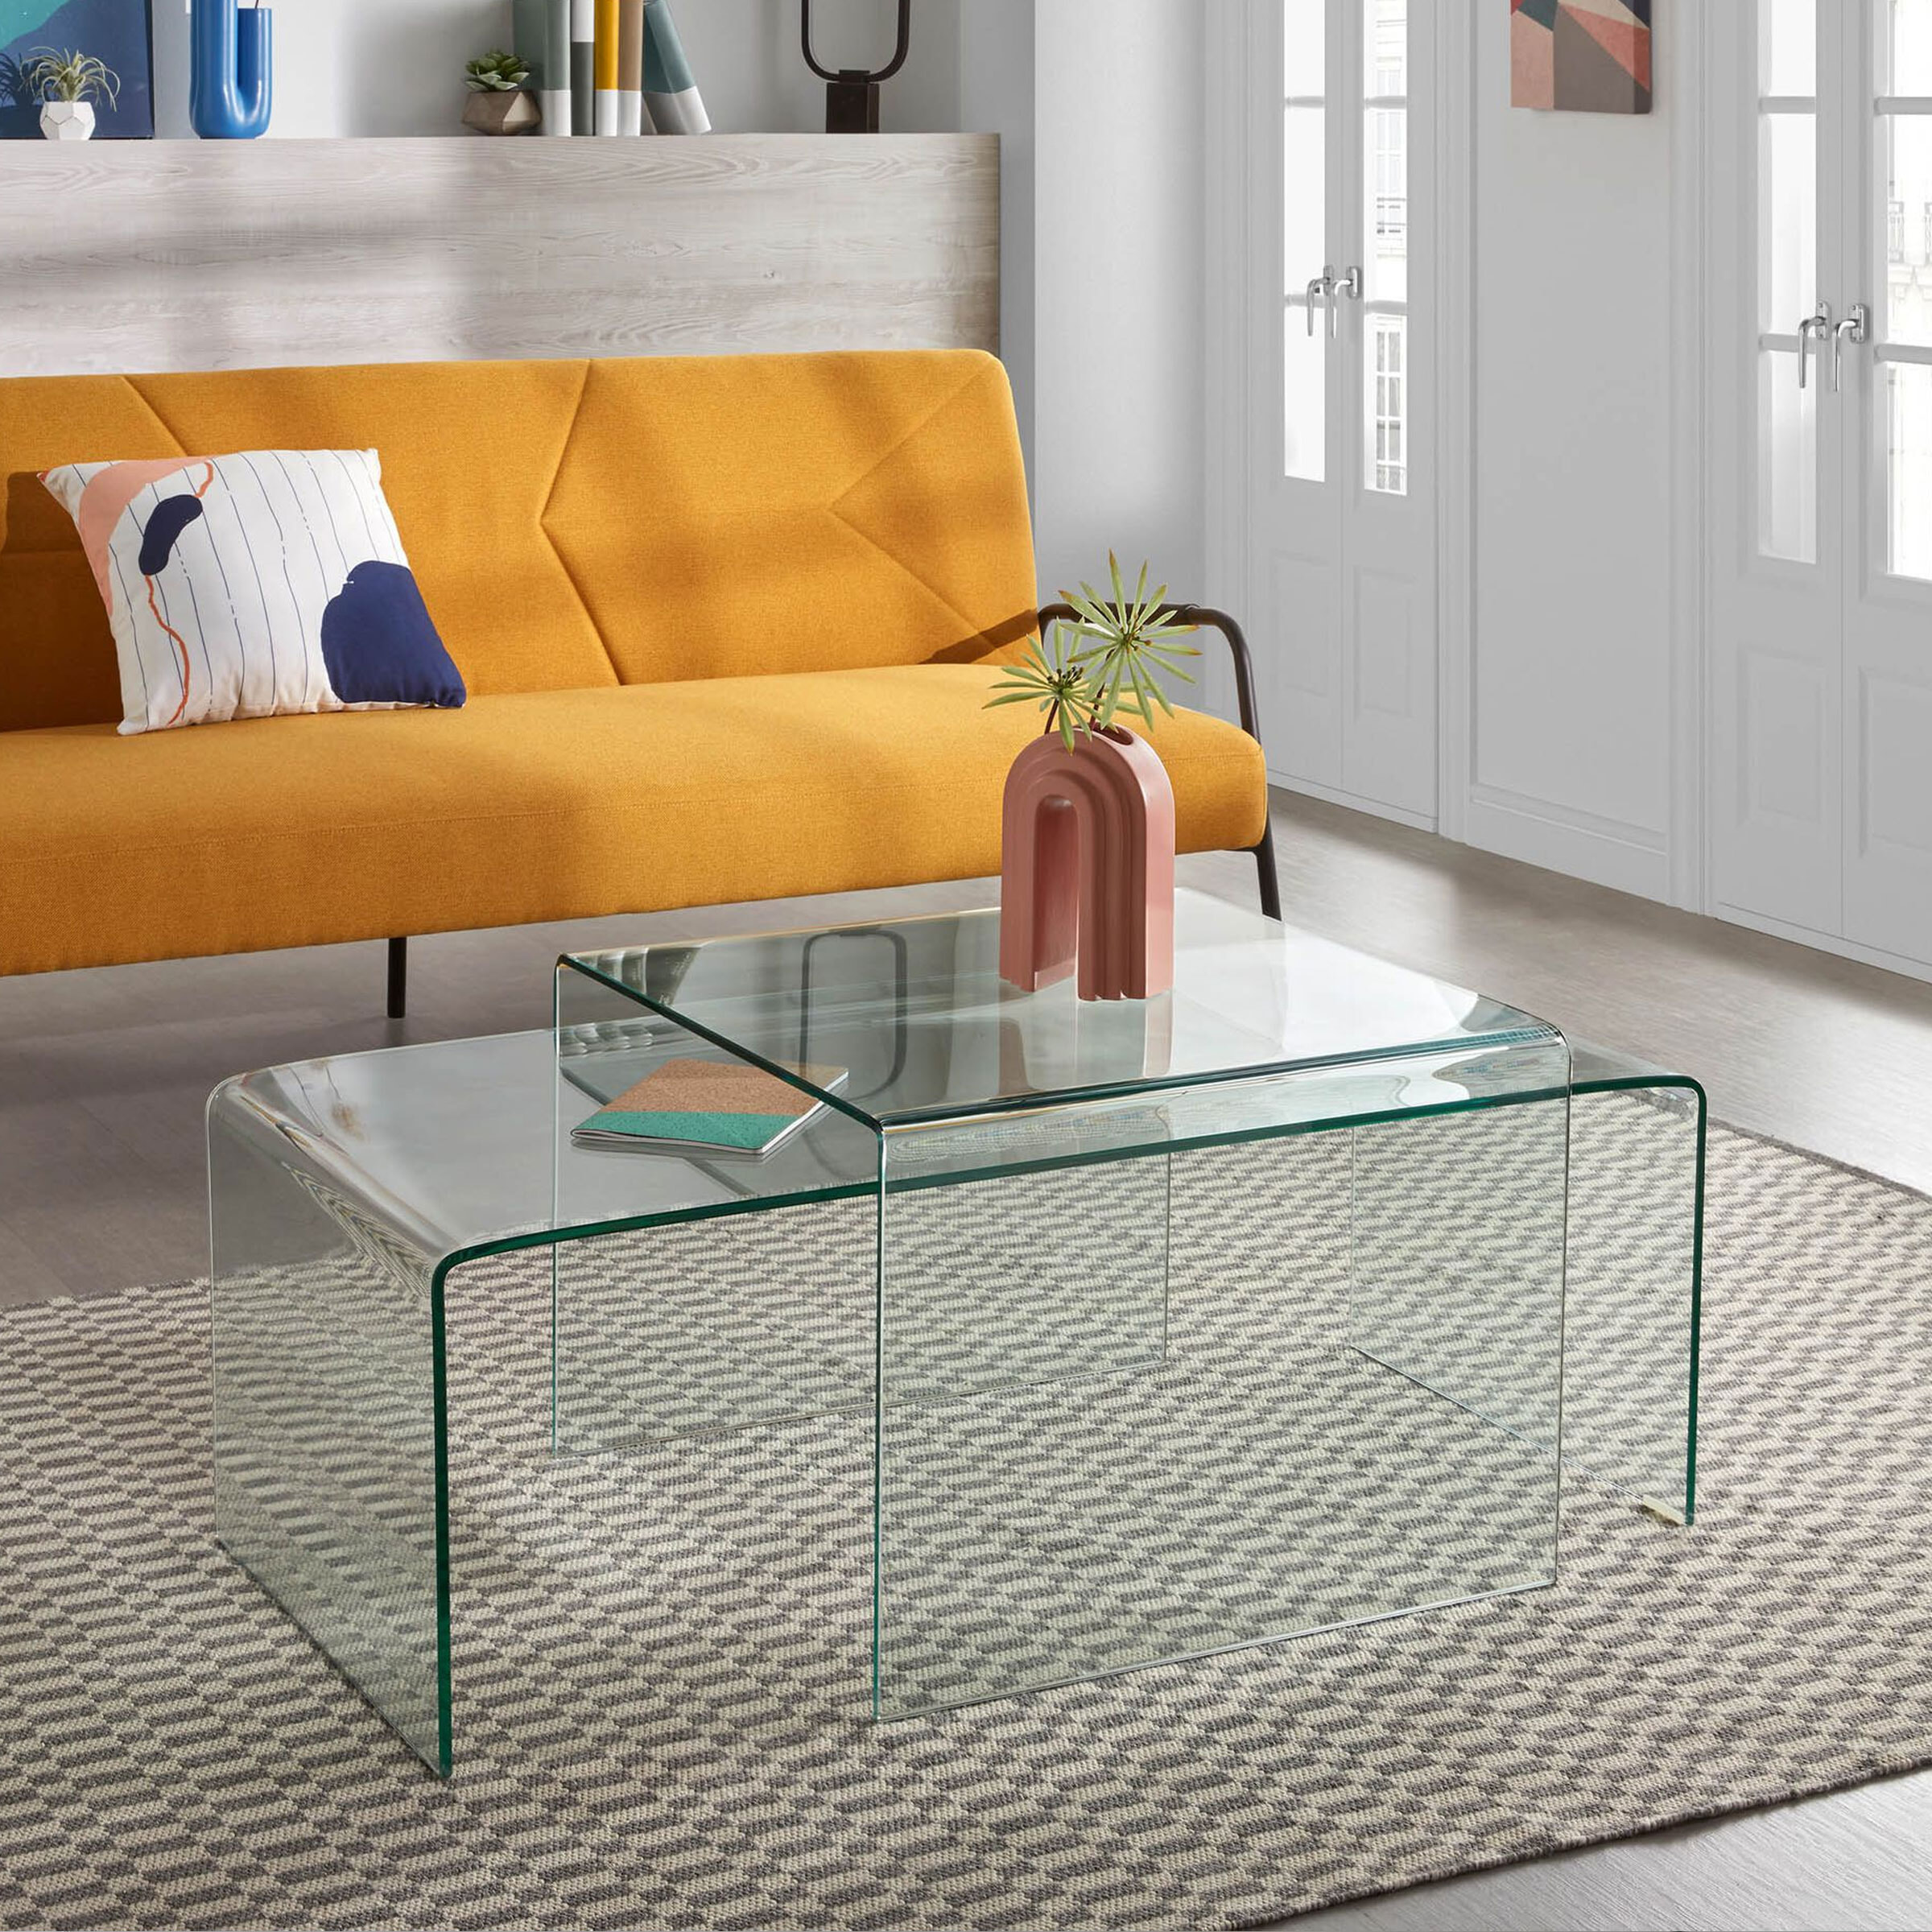 Kave Home Glazen Salontafel 'Burano', 110 x 50 cm